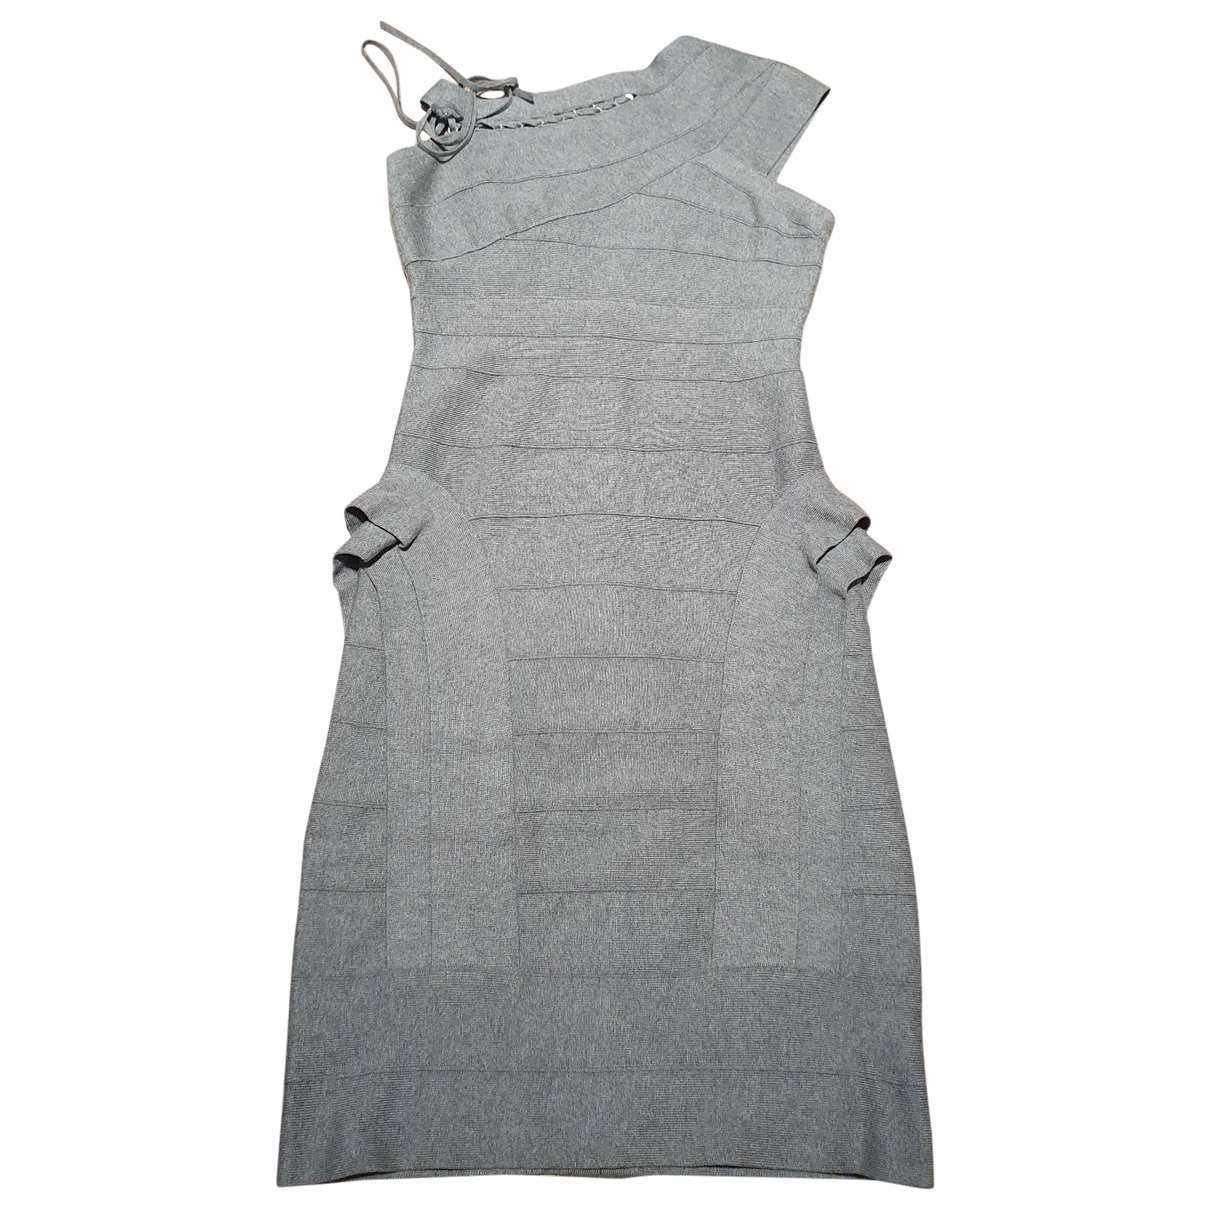 Herve Leger \N Grey Cotton - elasthane dress for Women M International